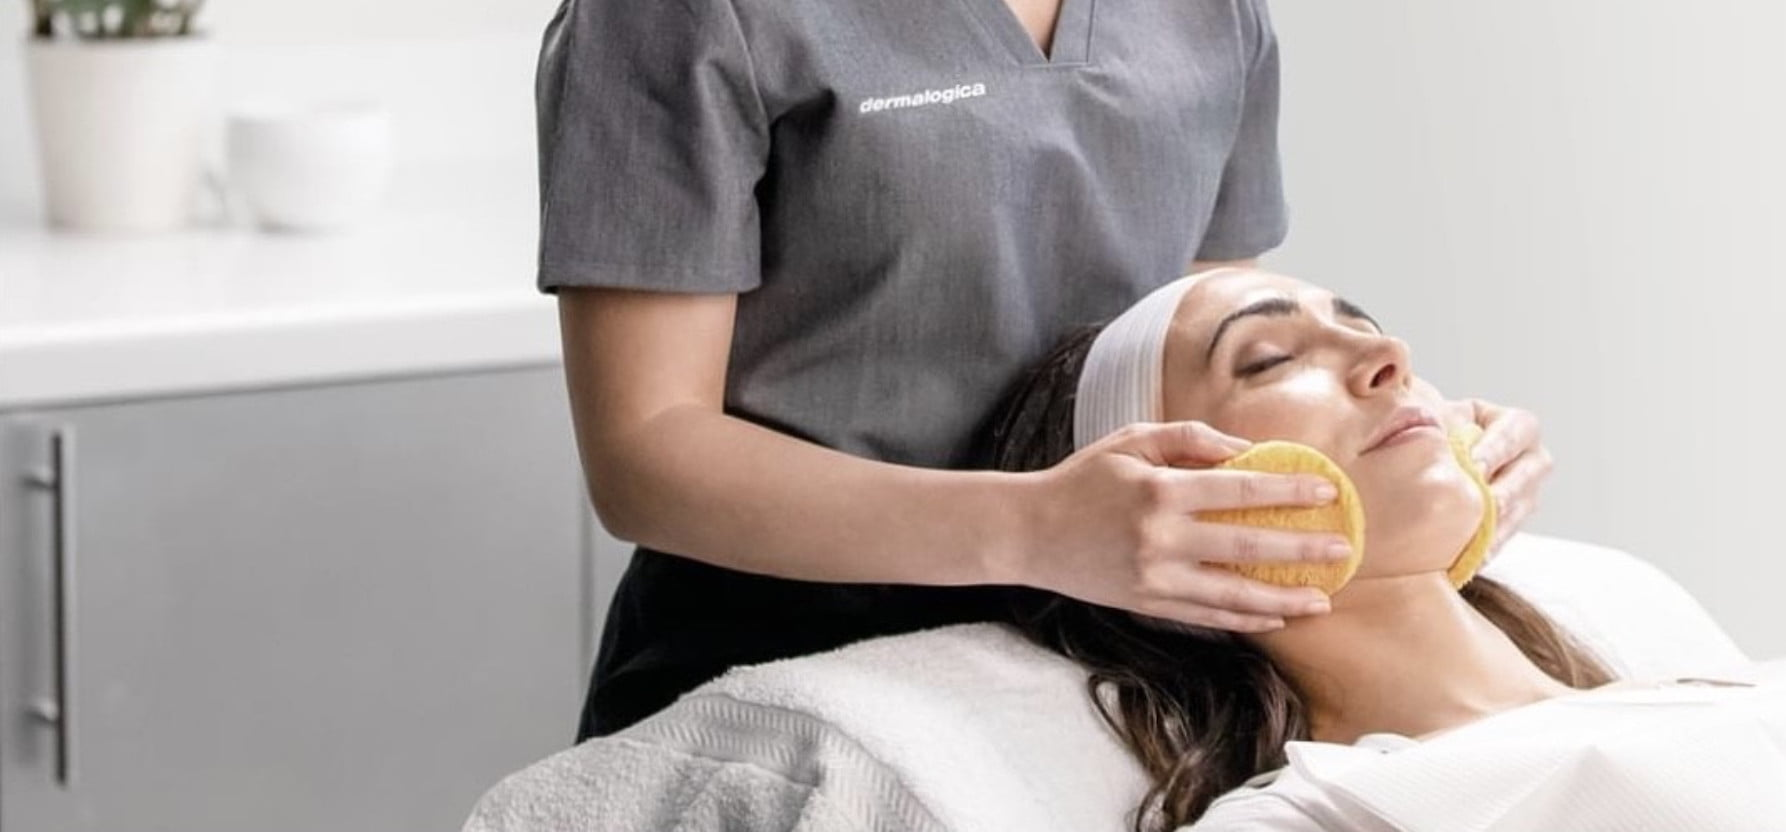 Dermalogica Treatment Copy